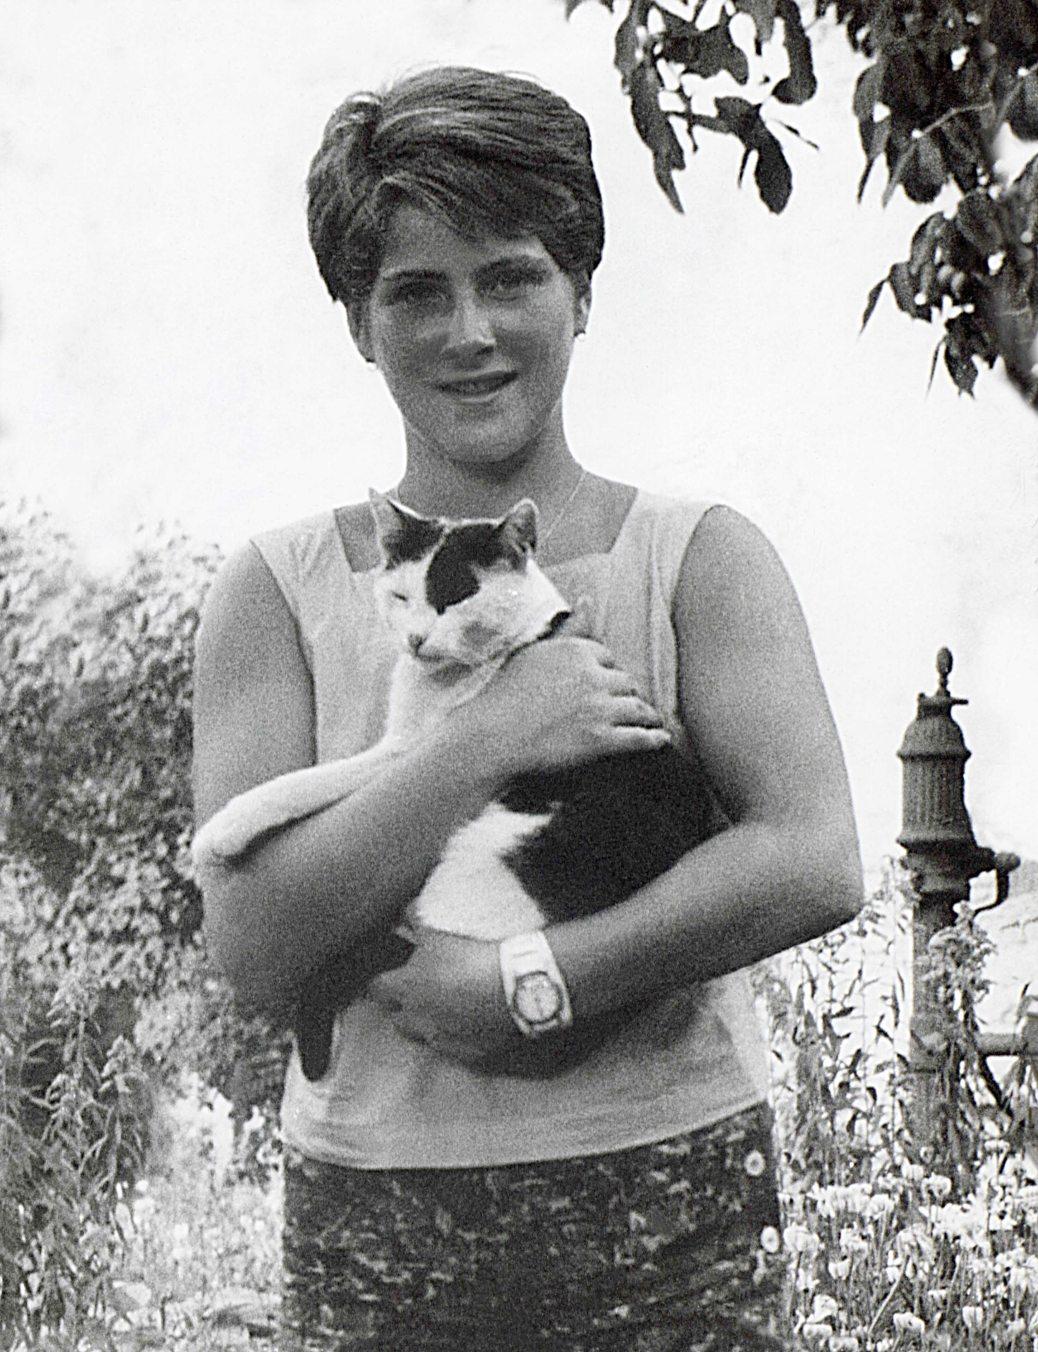 61 - Košice · Eva Kendeova (holding cat)